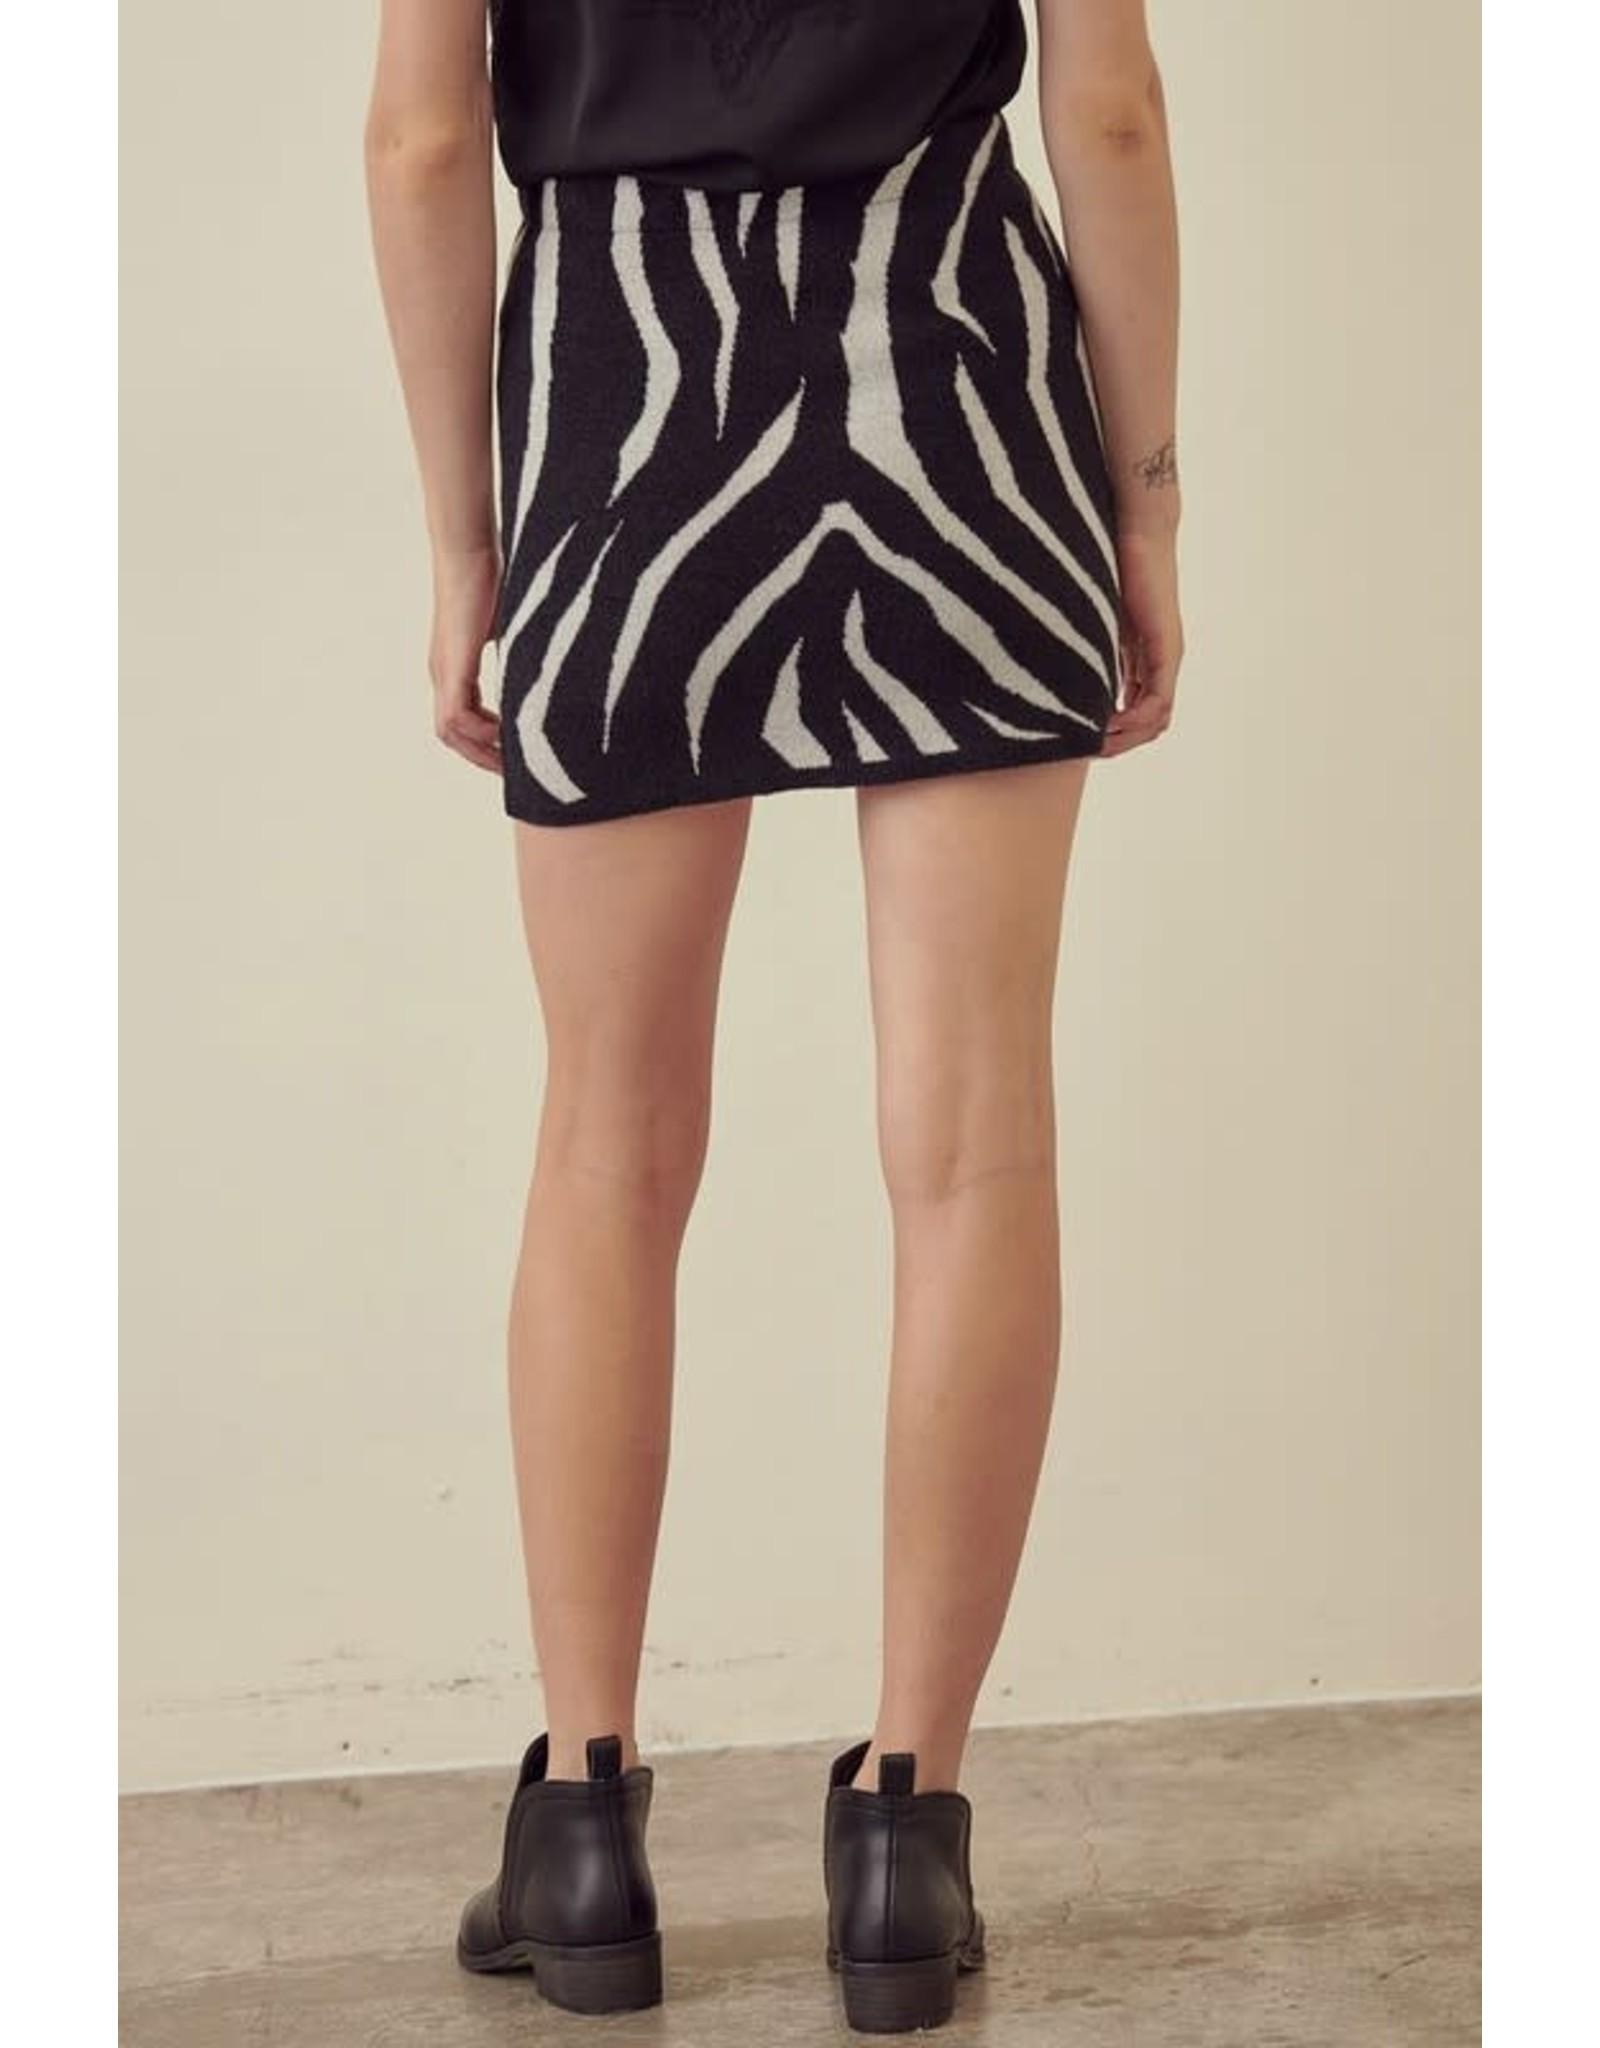 In The Wild Skirt